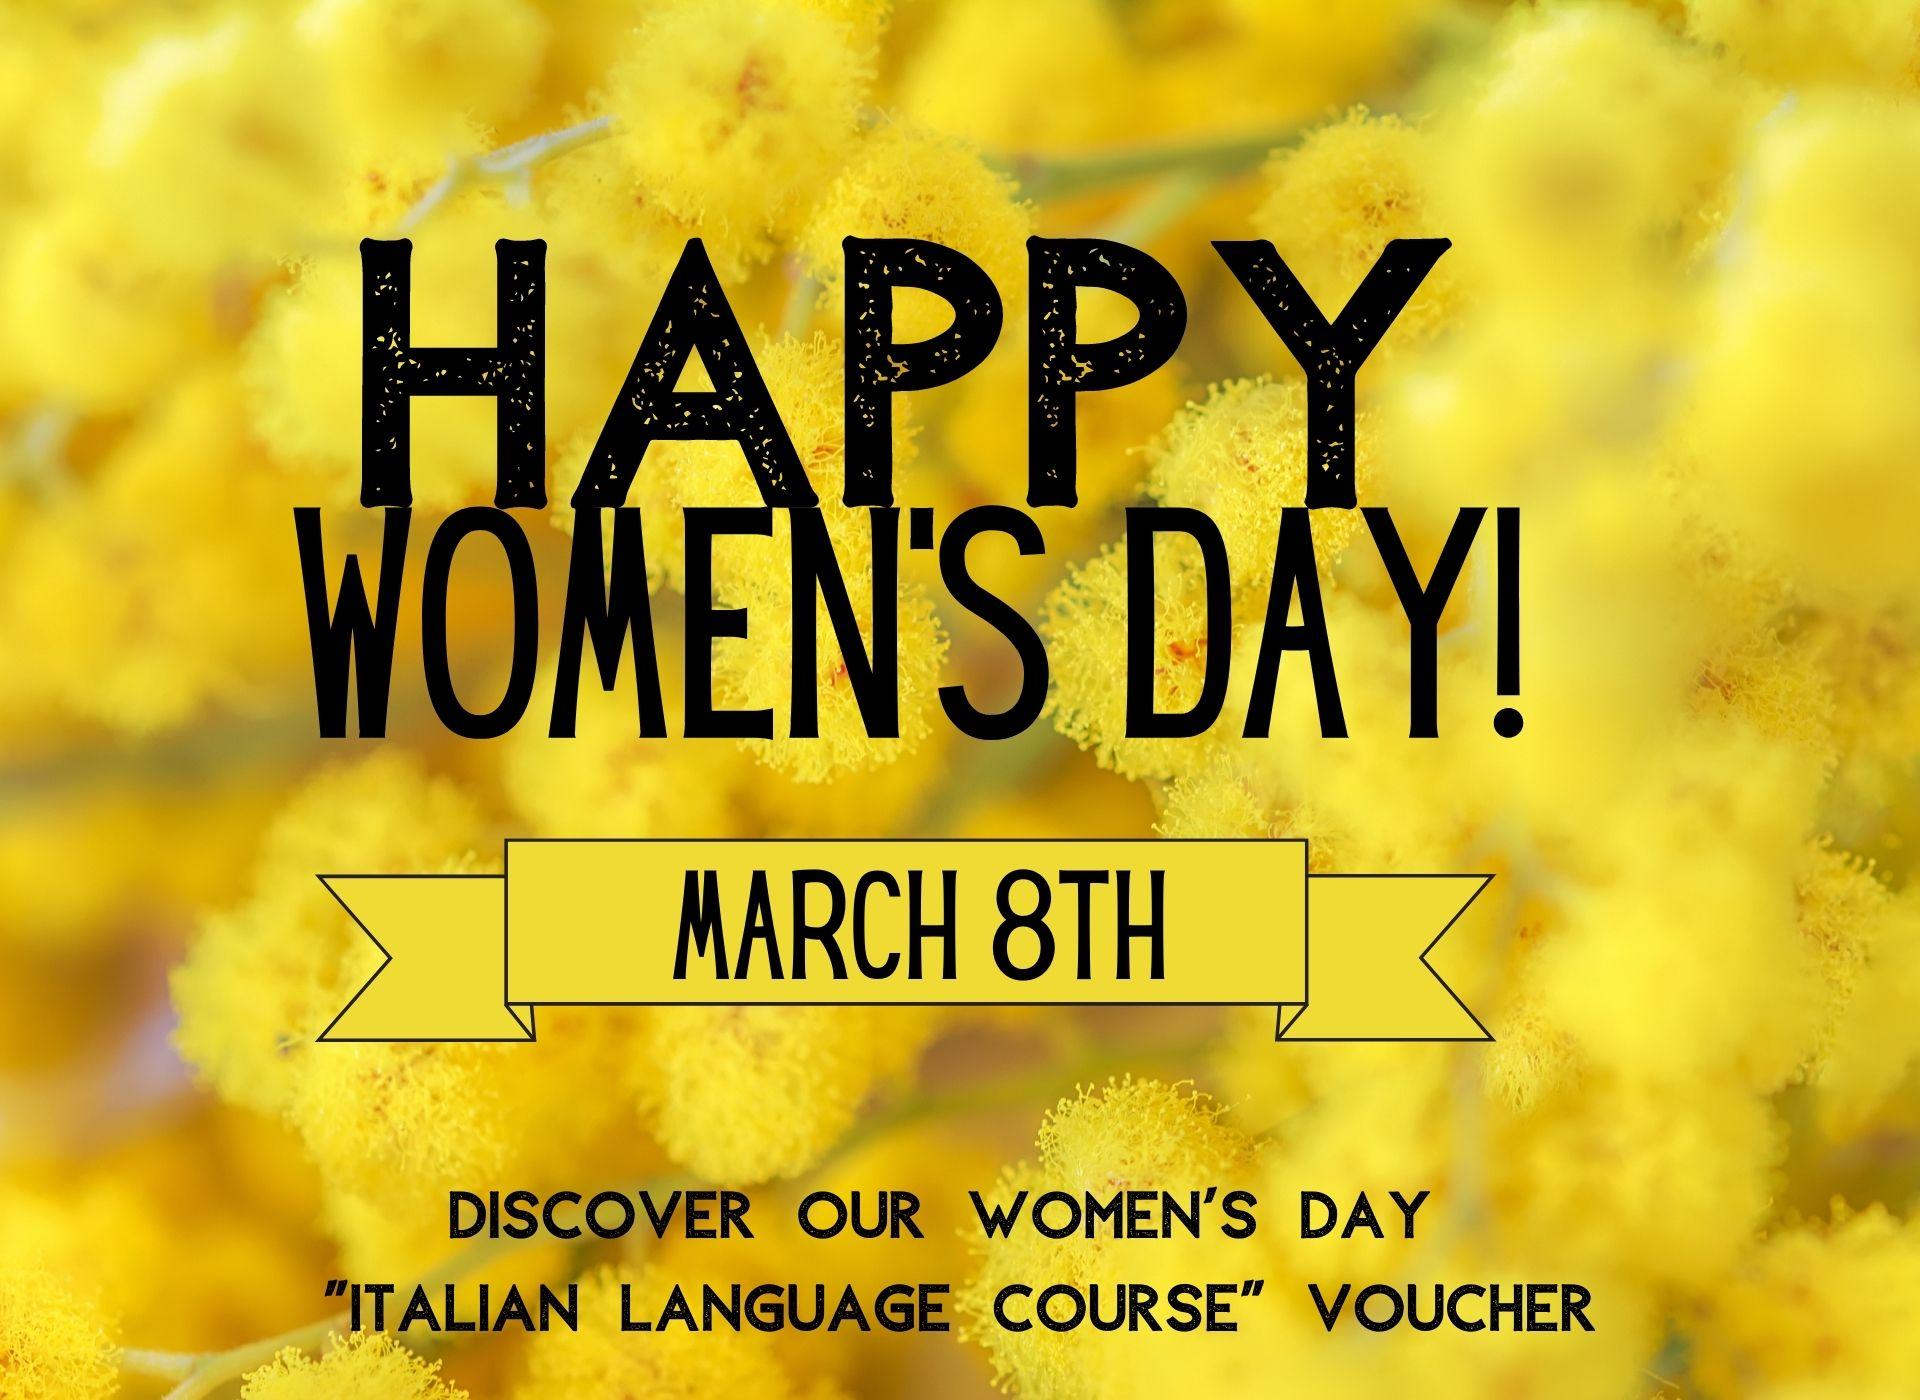 Women's Day Italian language course voucher